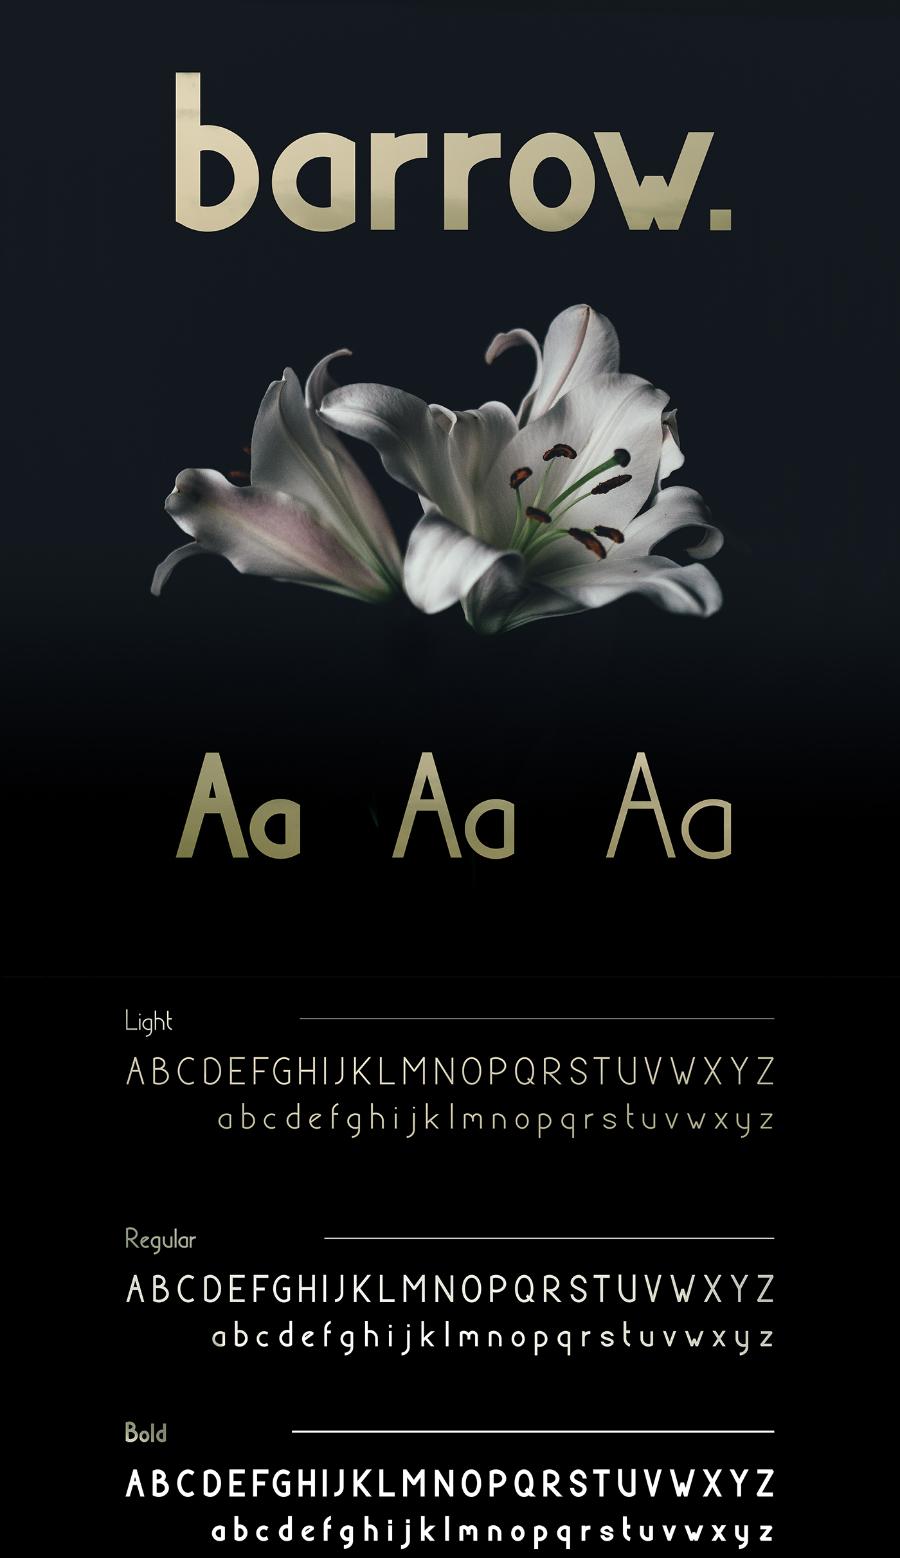 Barrow Typeface